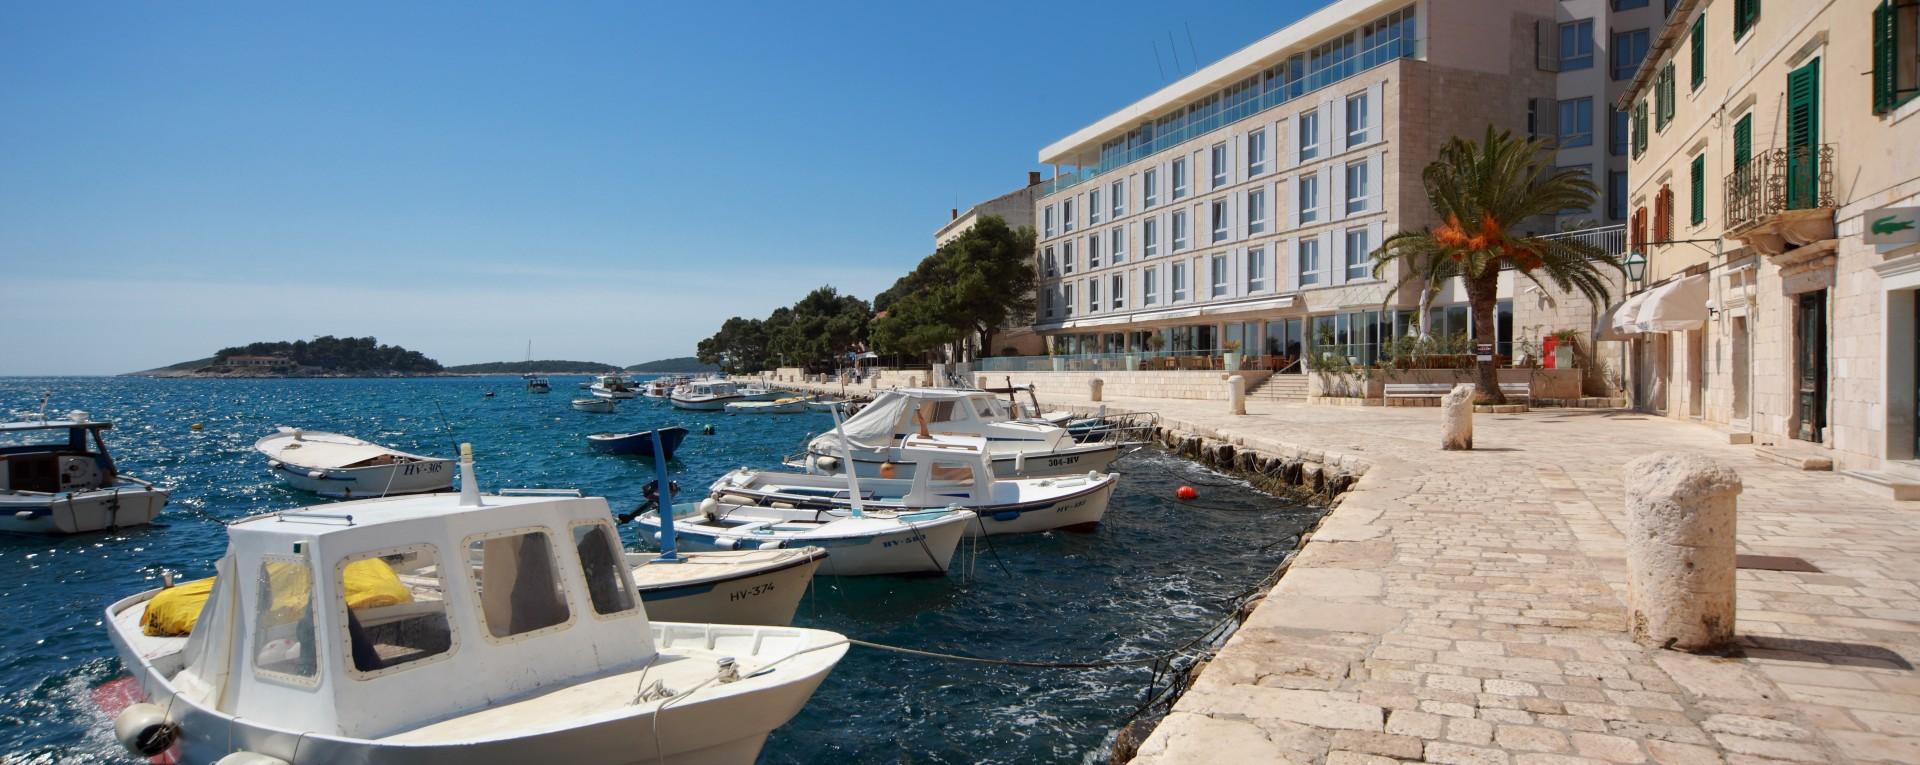 hotel adriana croatia 2018 world 39 s best hotels